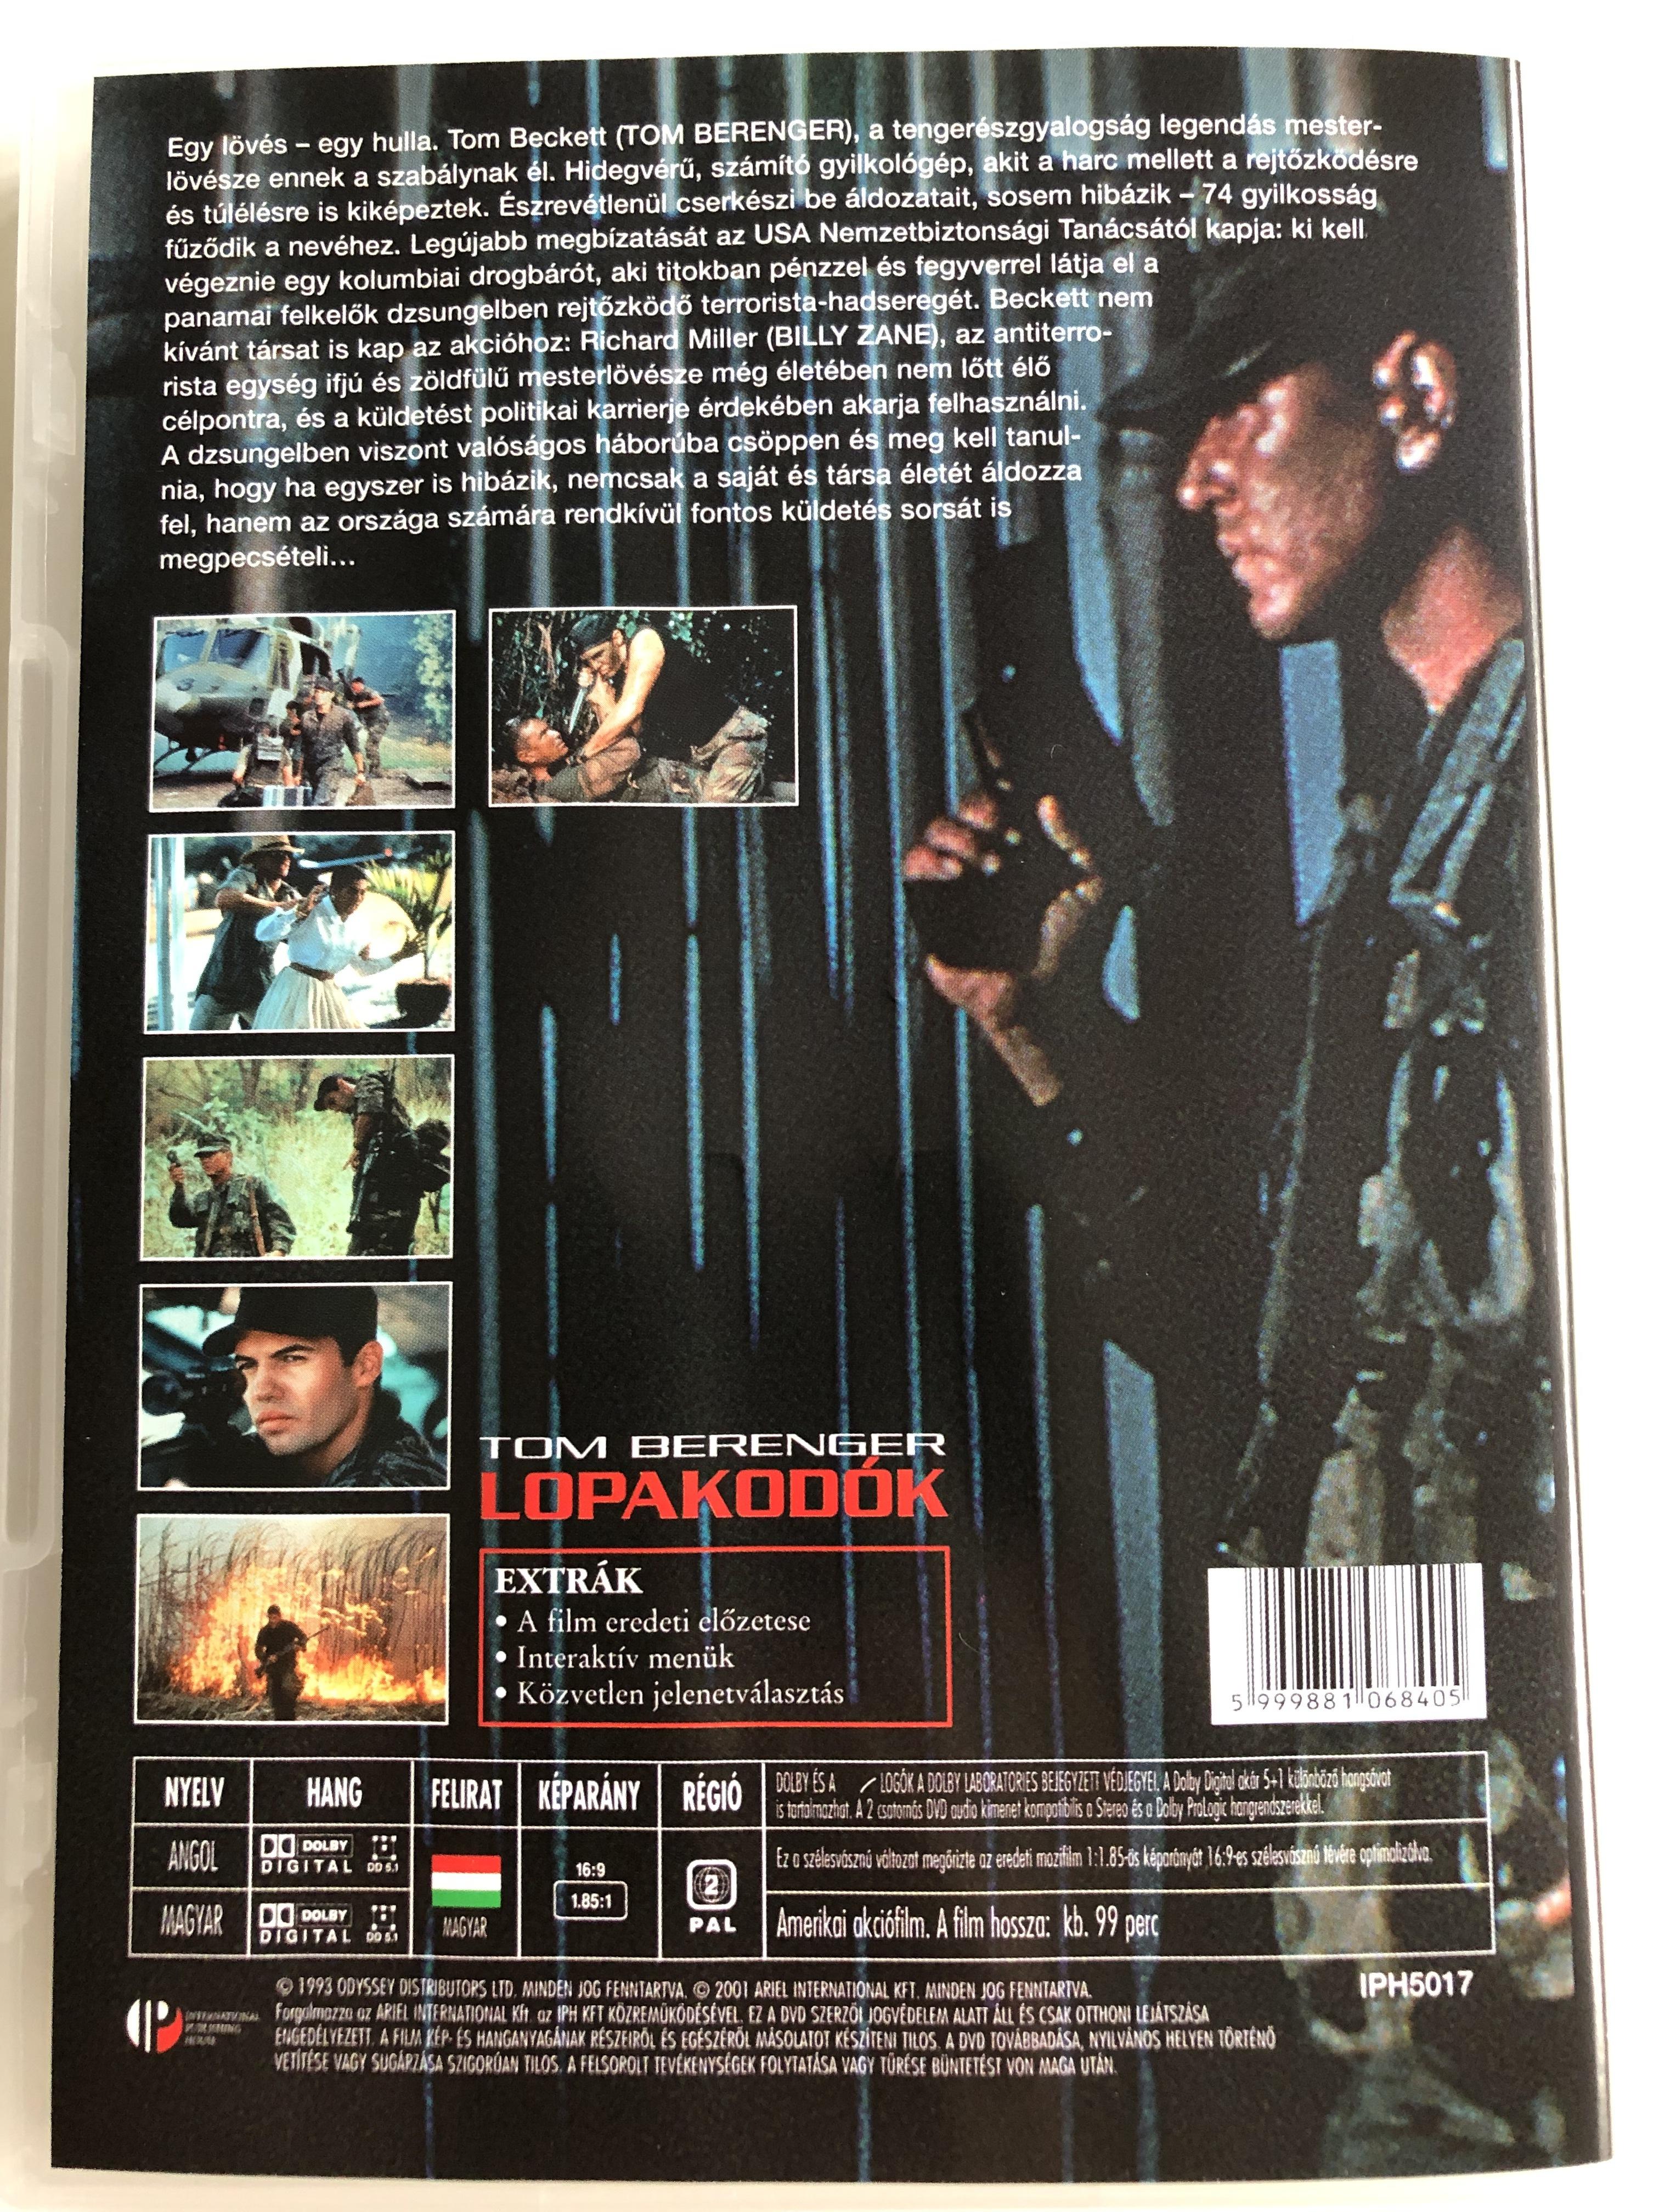 sniper-dvd-1993-lopakod-k-directed-by-luis-llosa-starring-tom-berenger-billy-zane-j.t.-walsh-2-.jpg